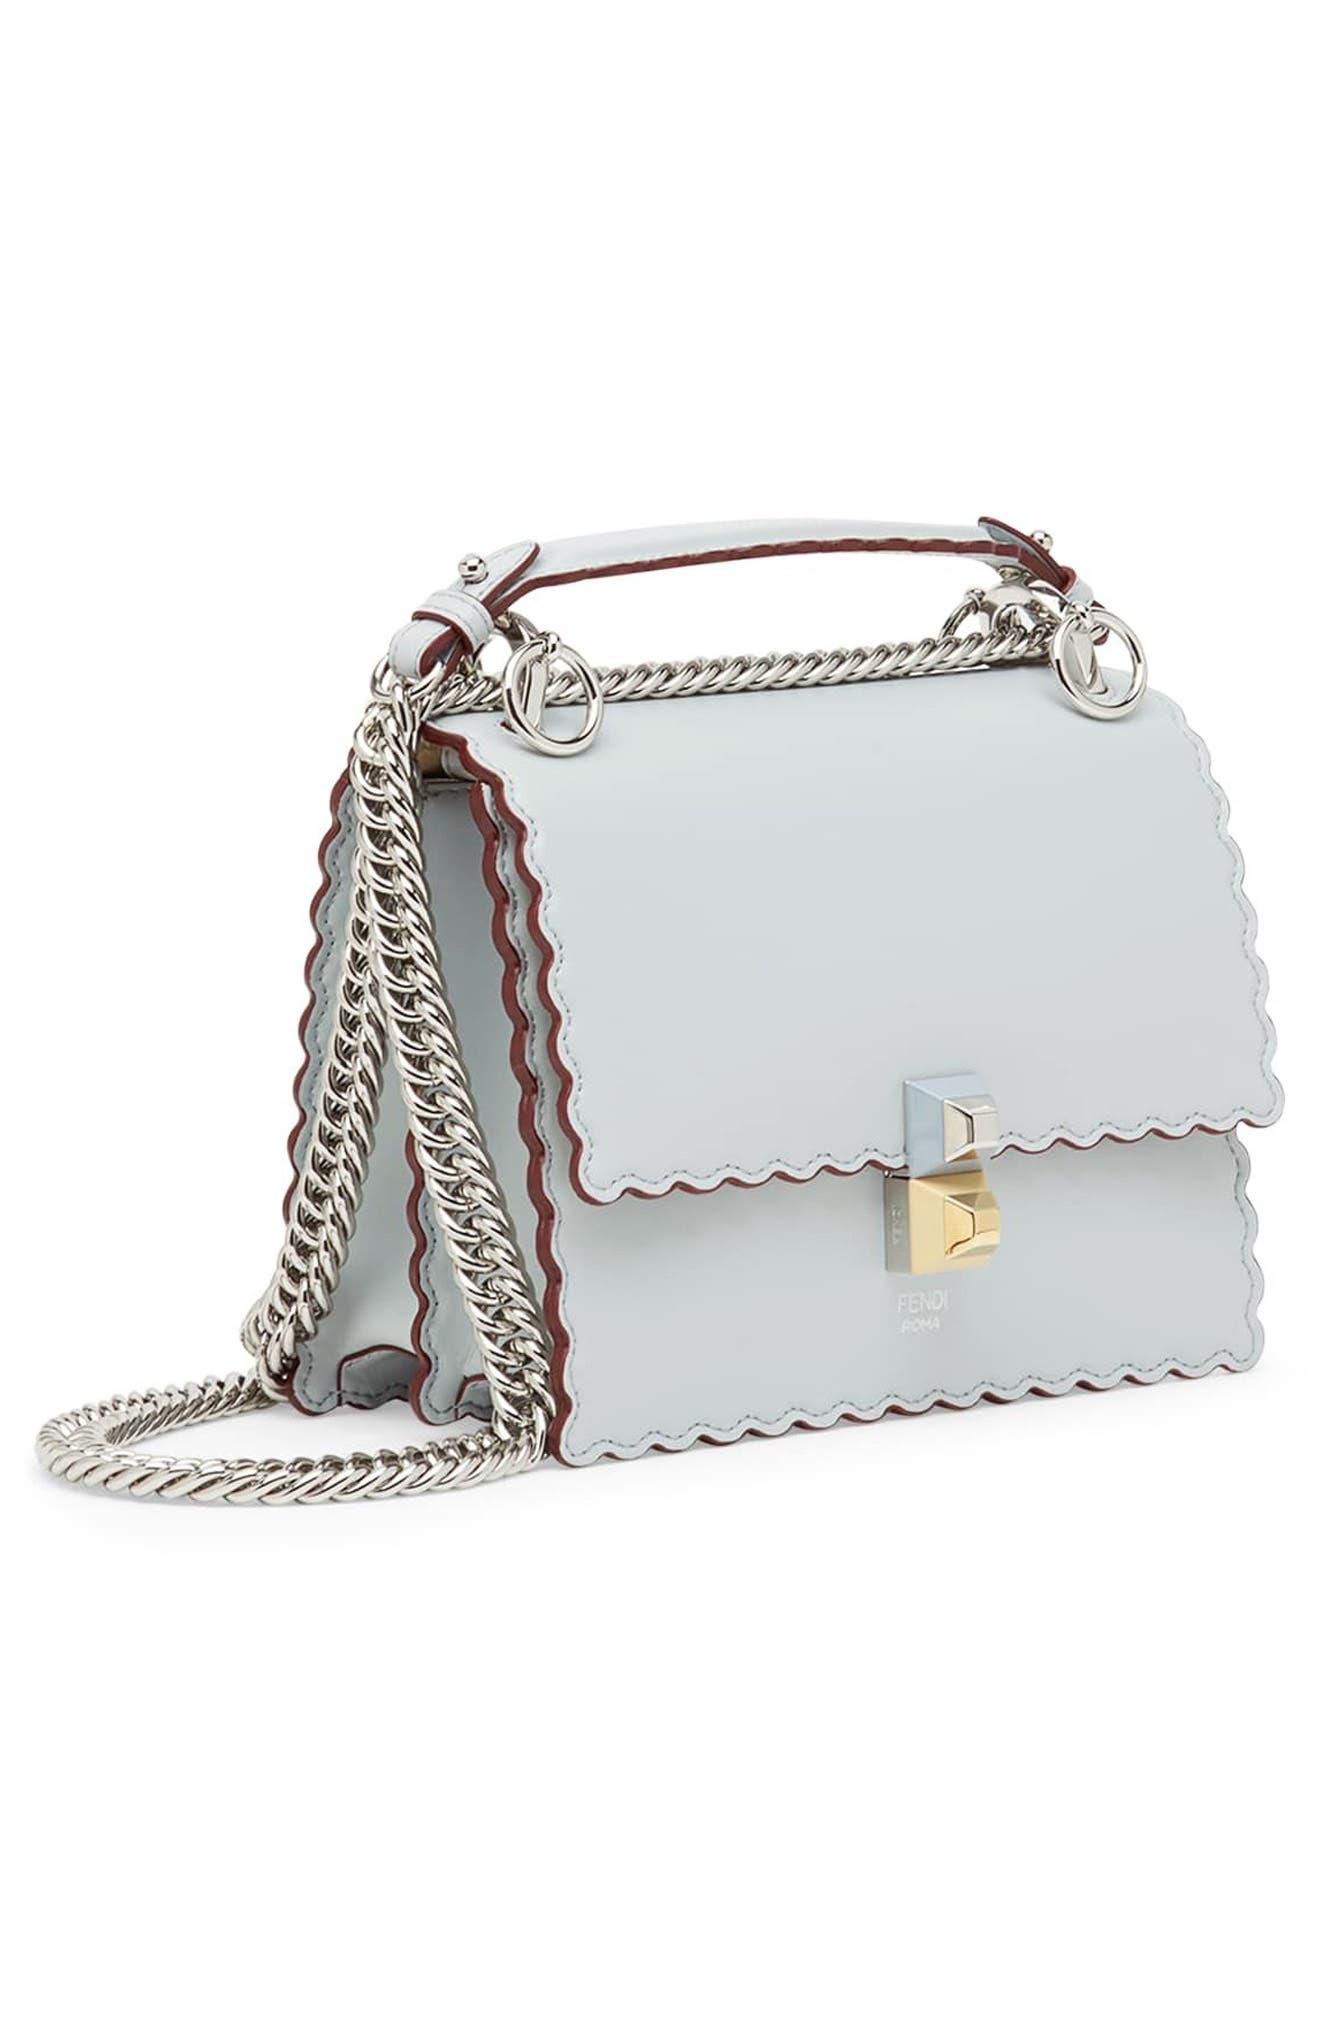 Mini Kan I Scalloped Leather Shoulder Bag,                             Alternate thumbnail 4, color,                             Grigio Perla/ Palladio